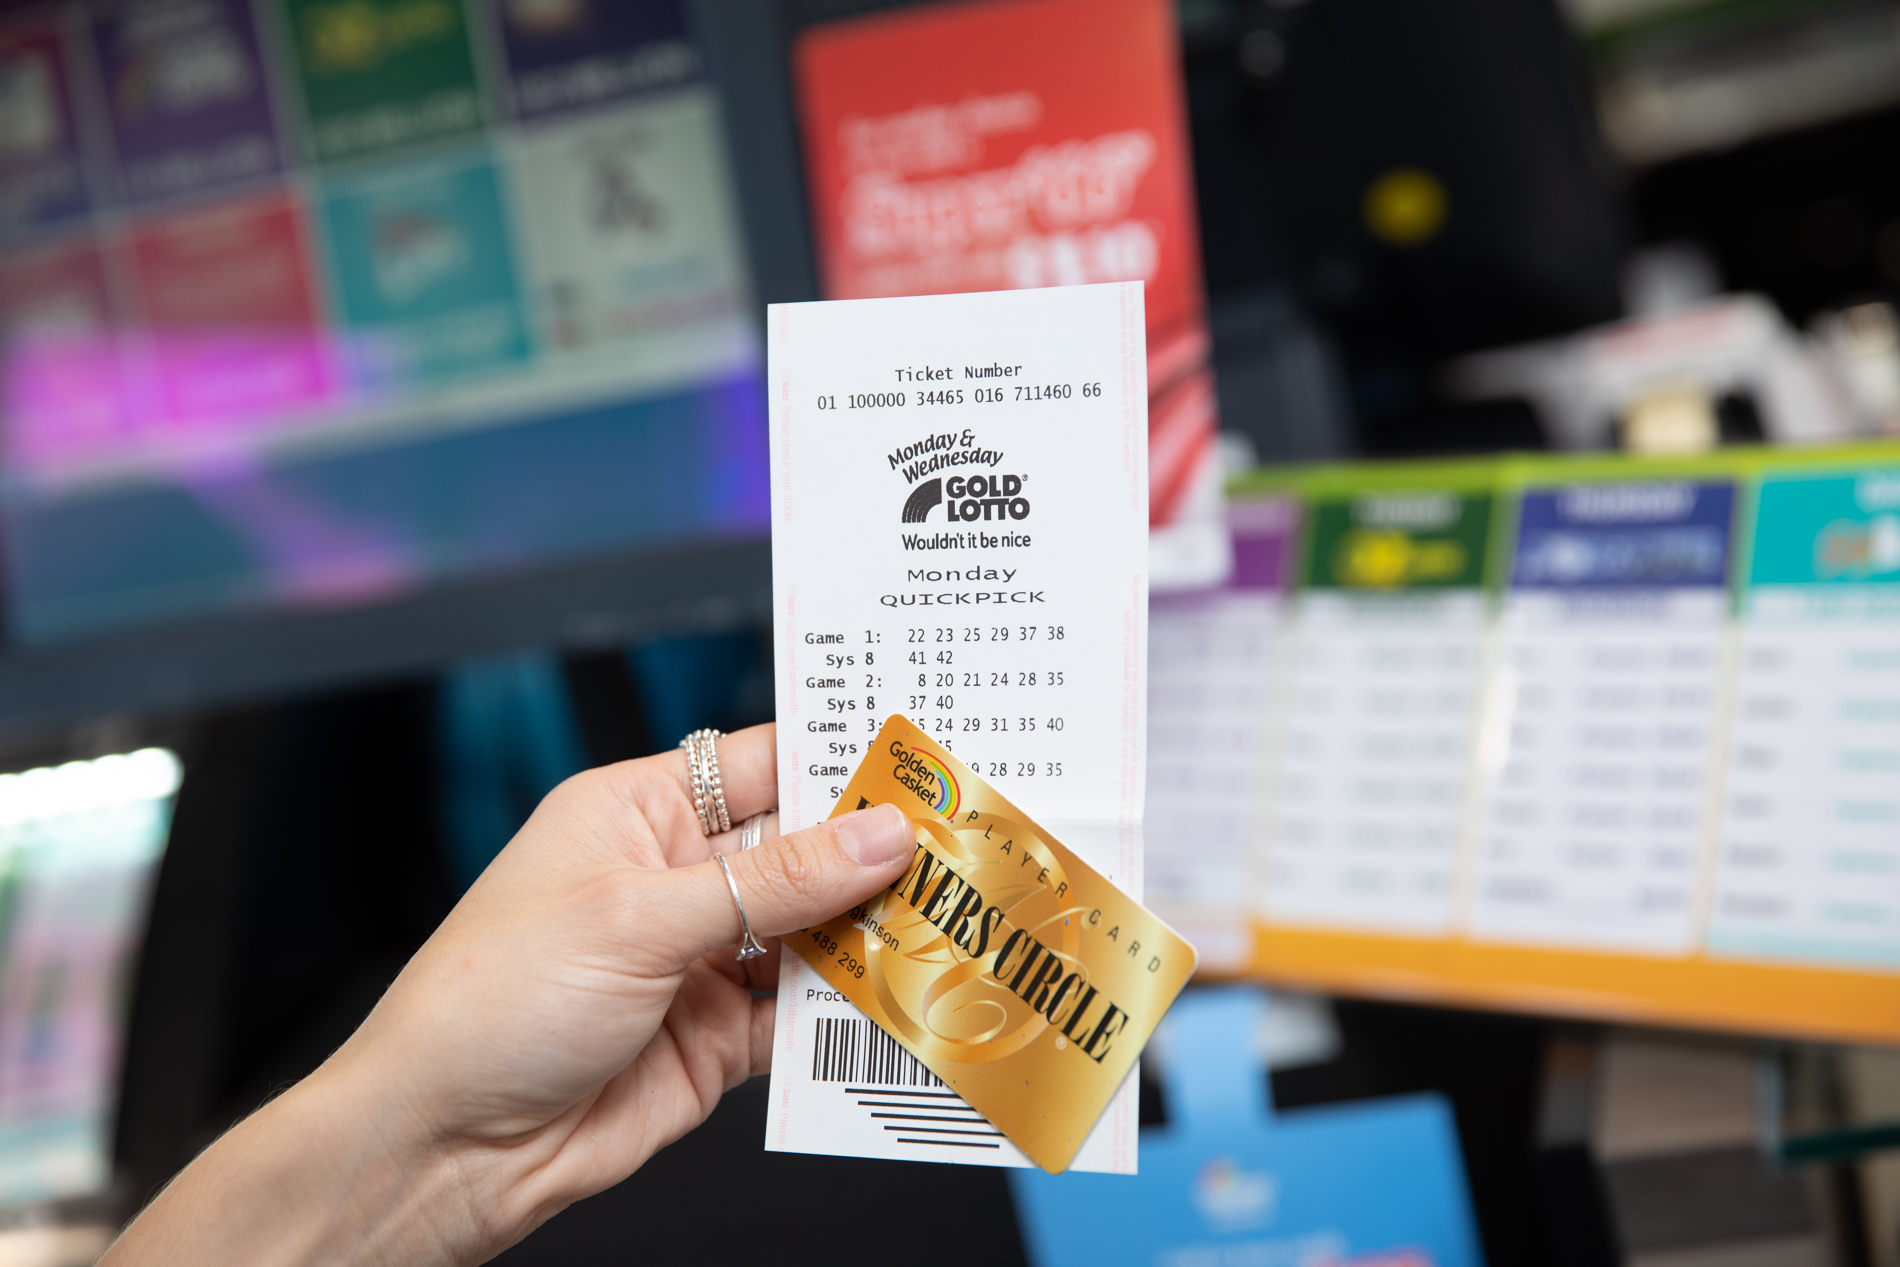 Queensland grandpa's impulse Lotto ticket wins big